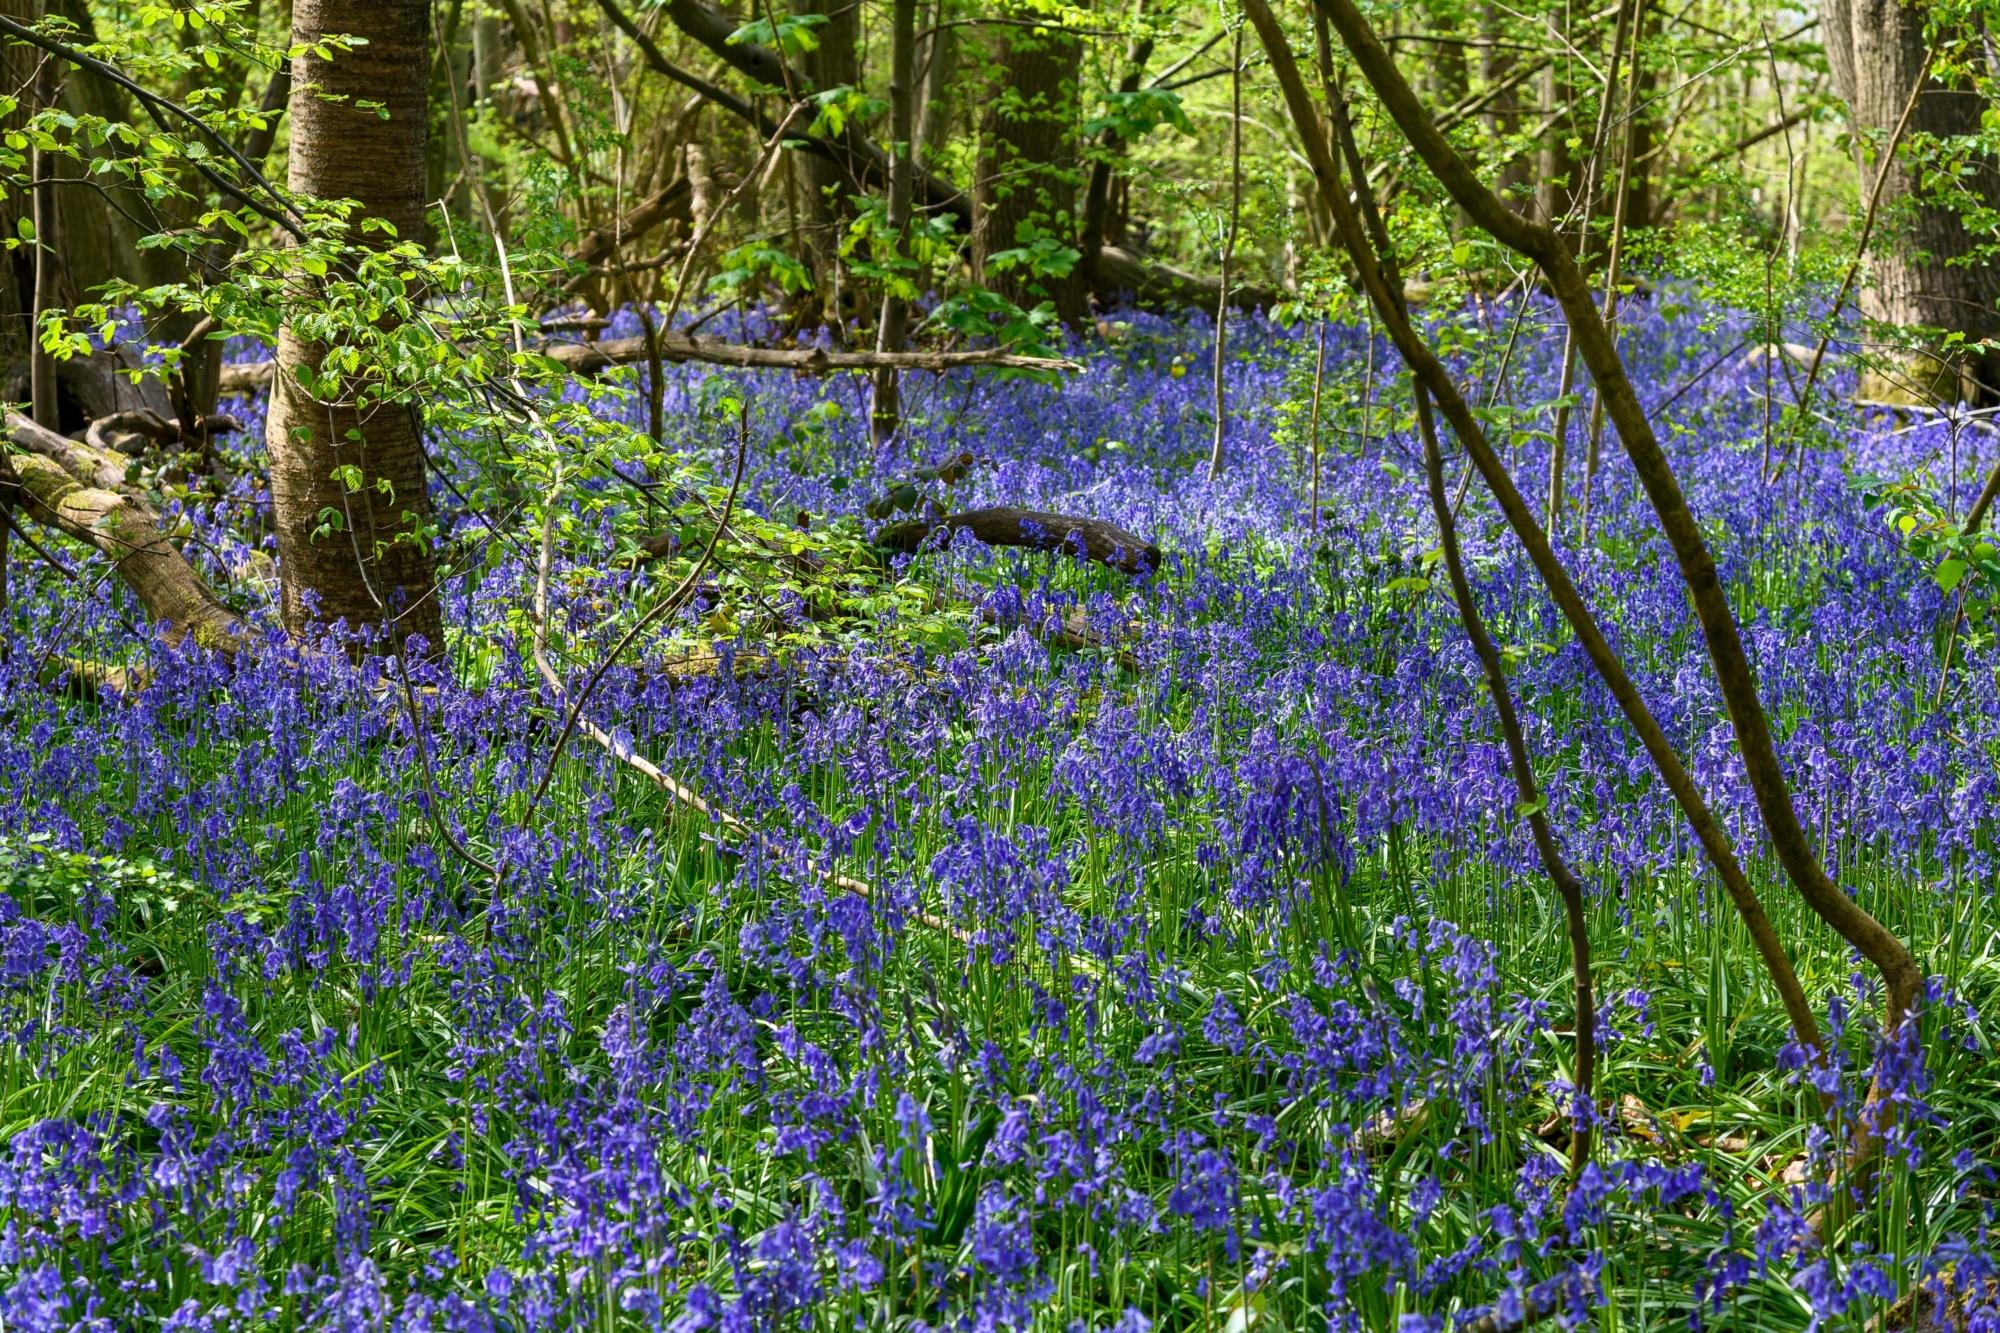 Bluebell Wood in Trosley Country Park near Gravesend, Kent